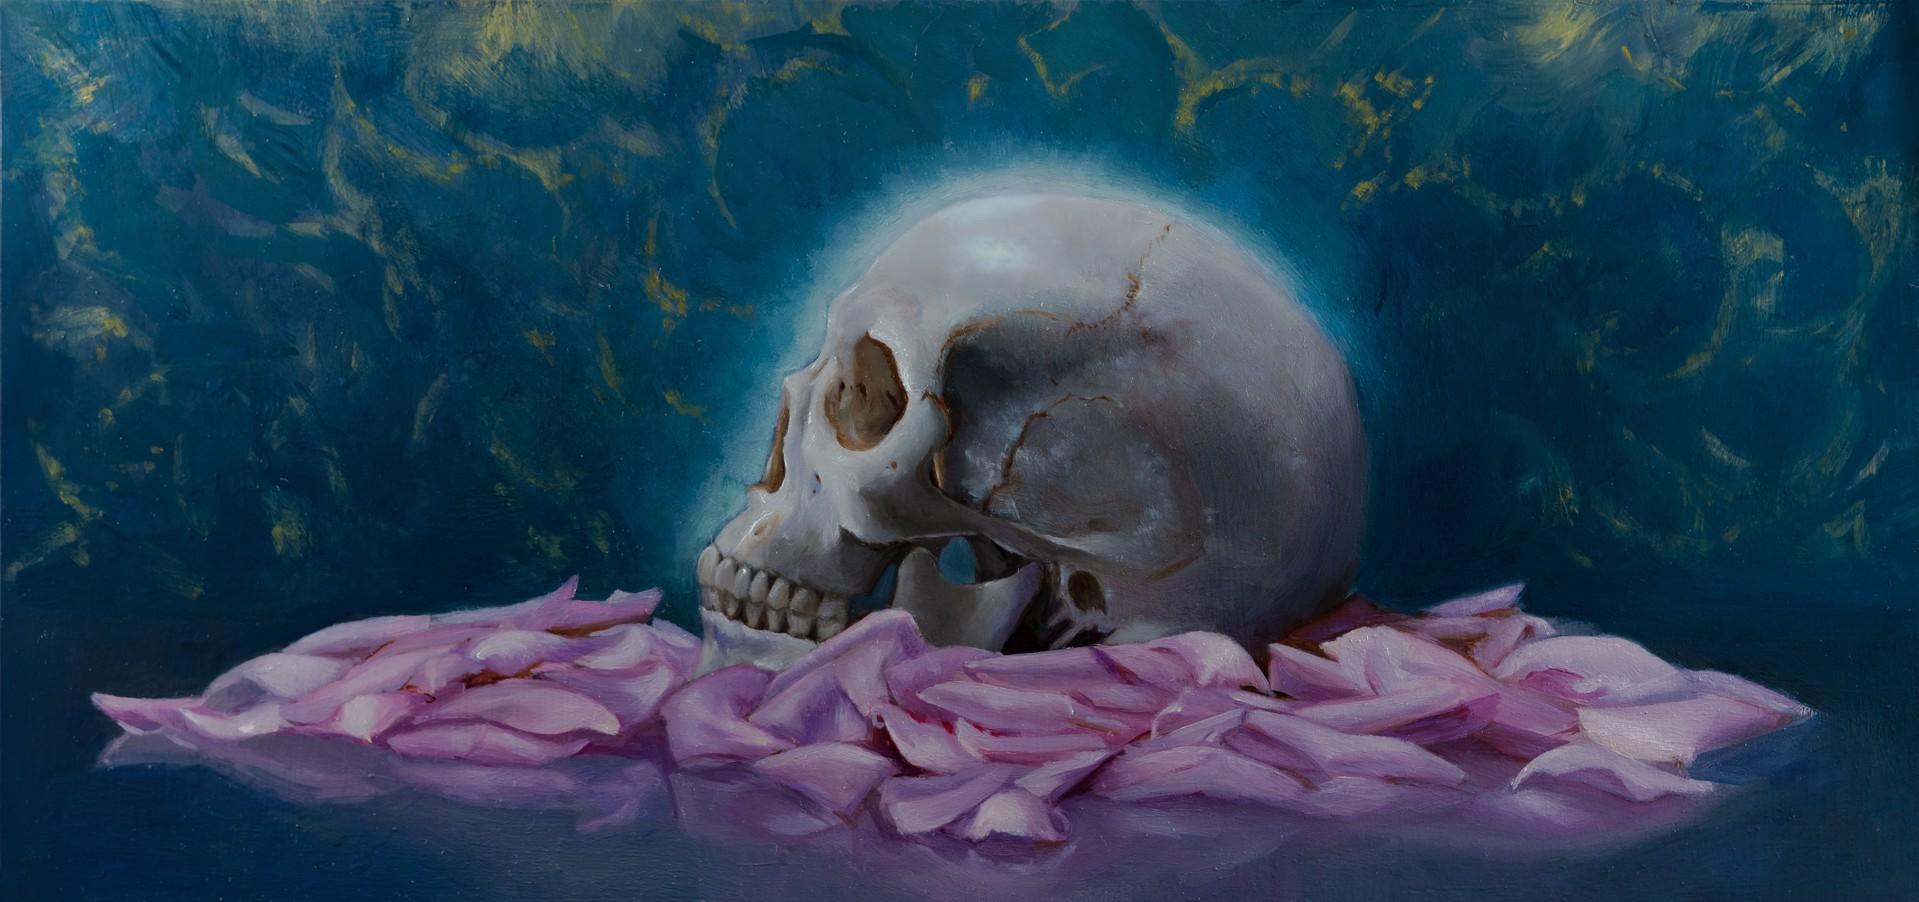 Ofrenda by Ximena Rendon